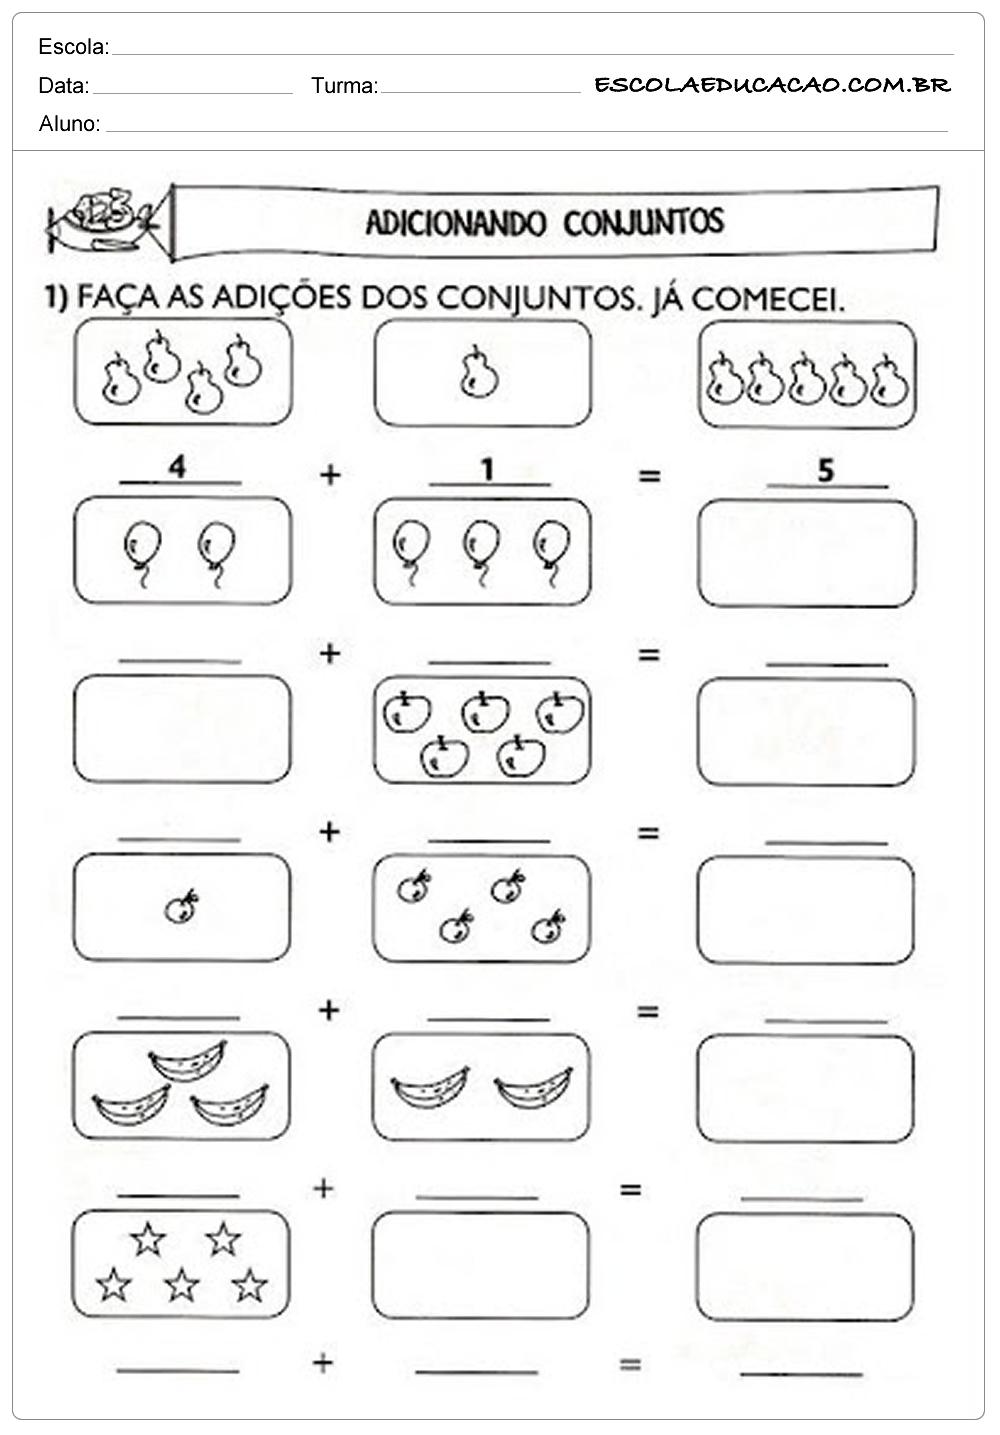 Atividades de Matemática 1º ano – Adicionando Conjuntos